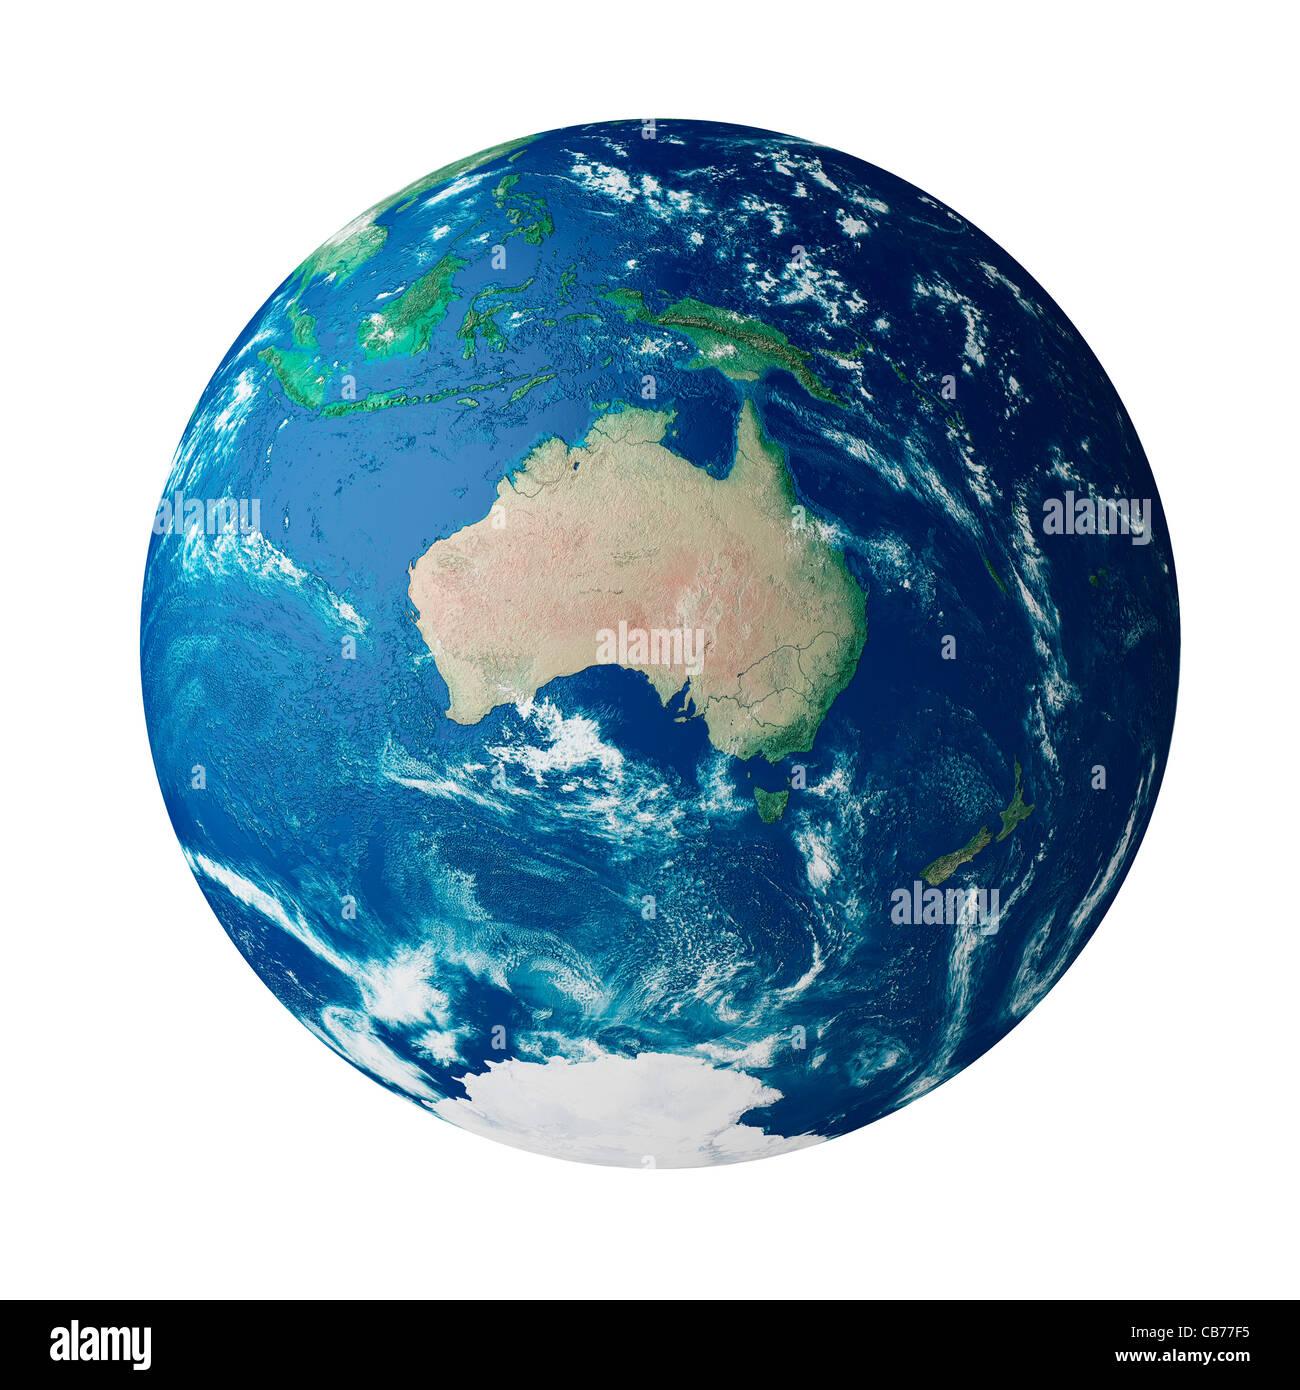 Globus, die den Kontinent Australien auf dem Planeten Erde Stockbild